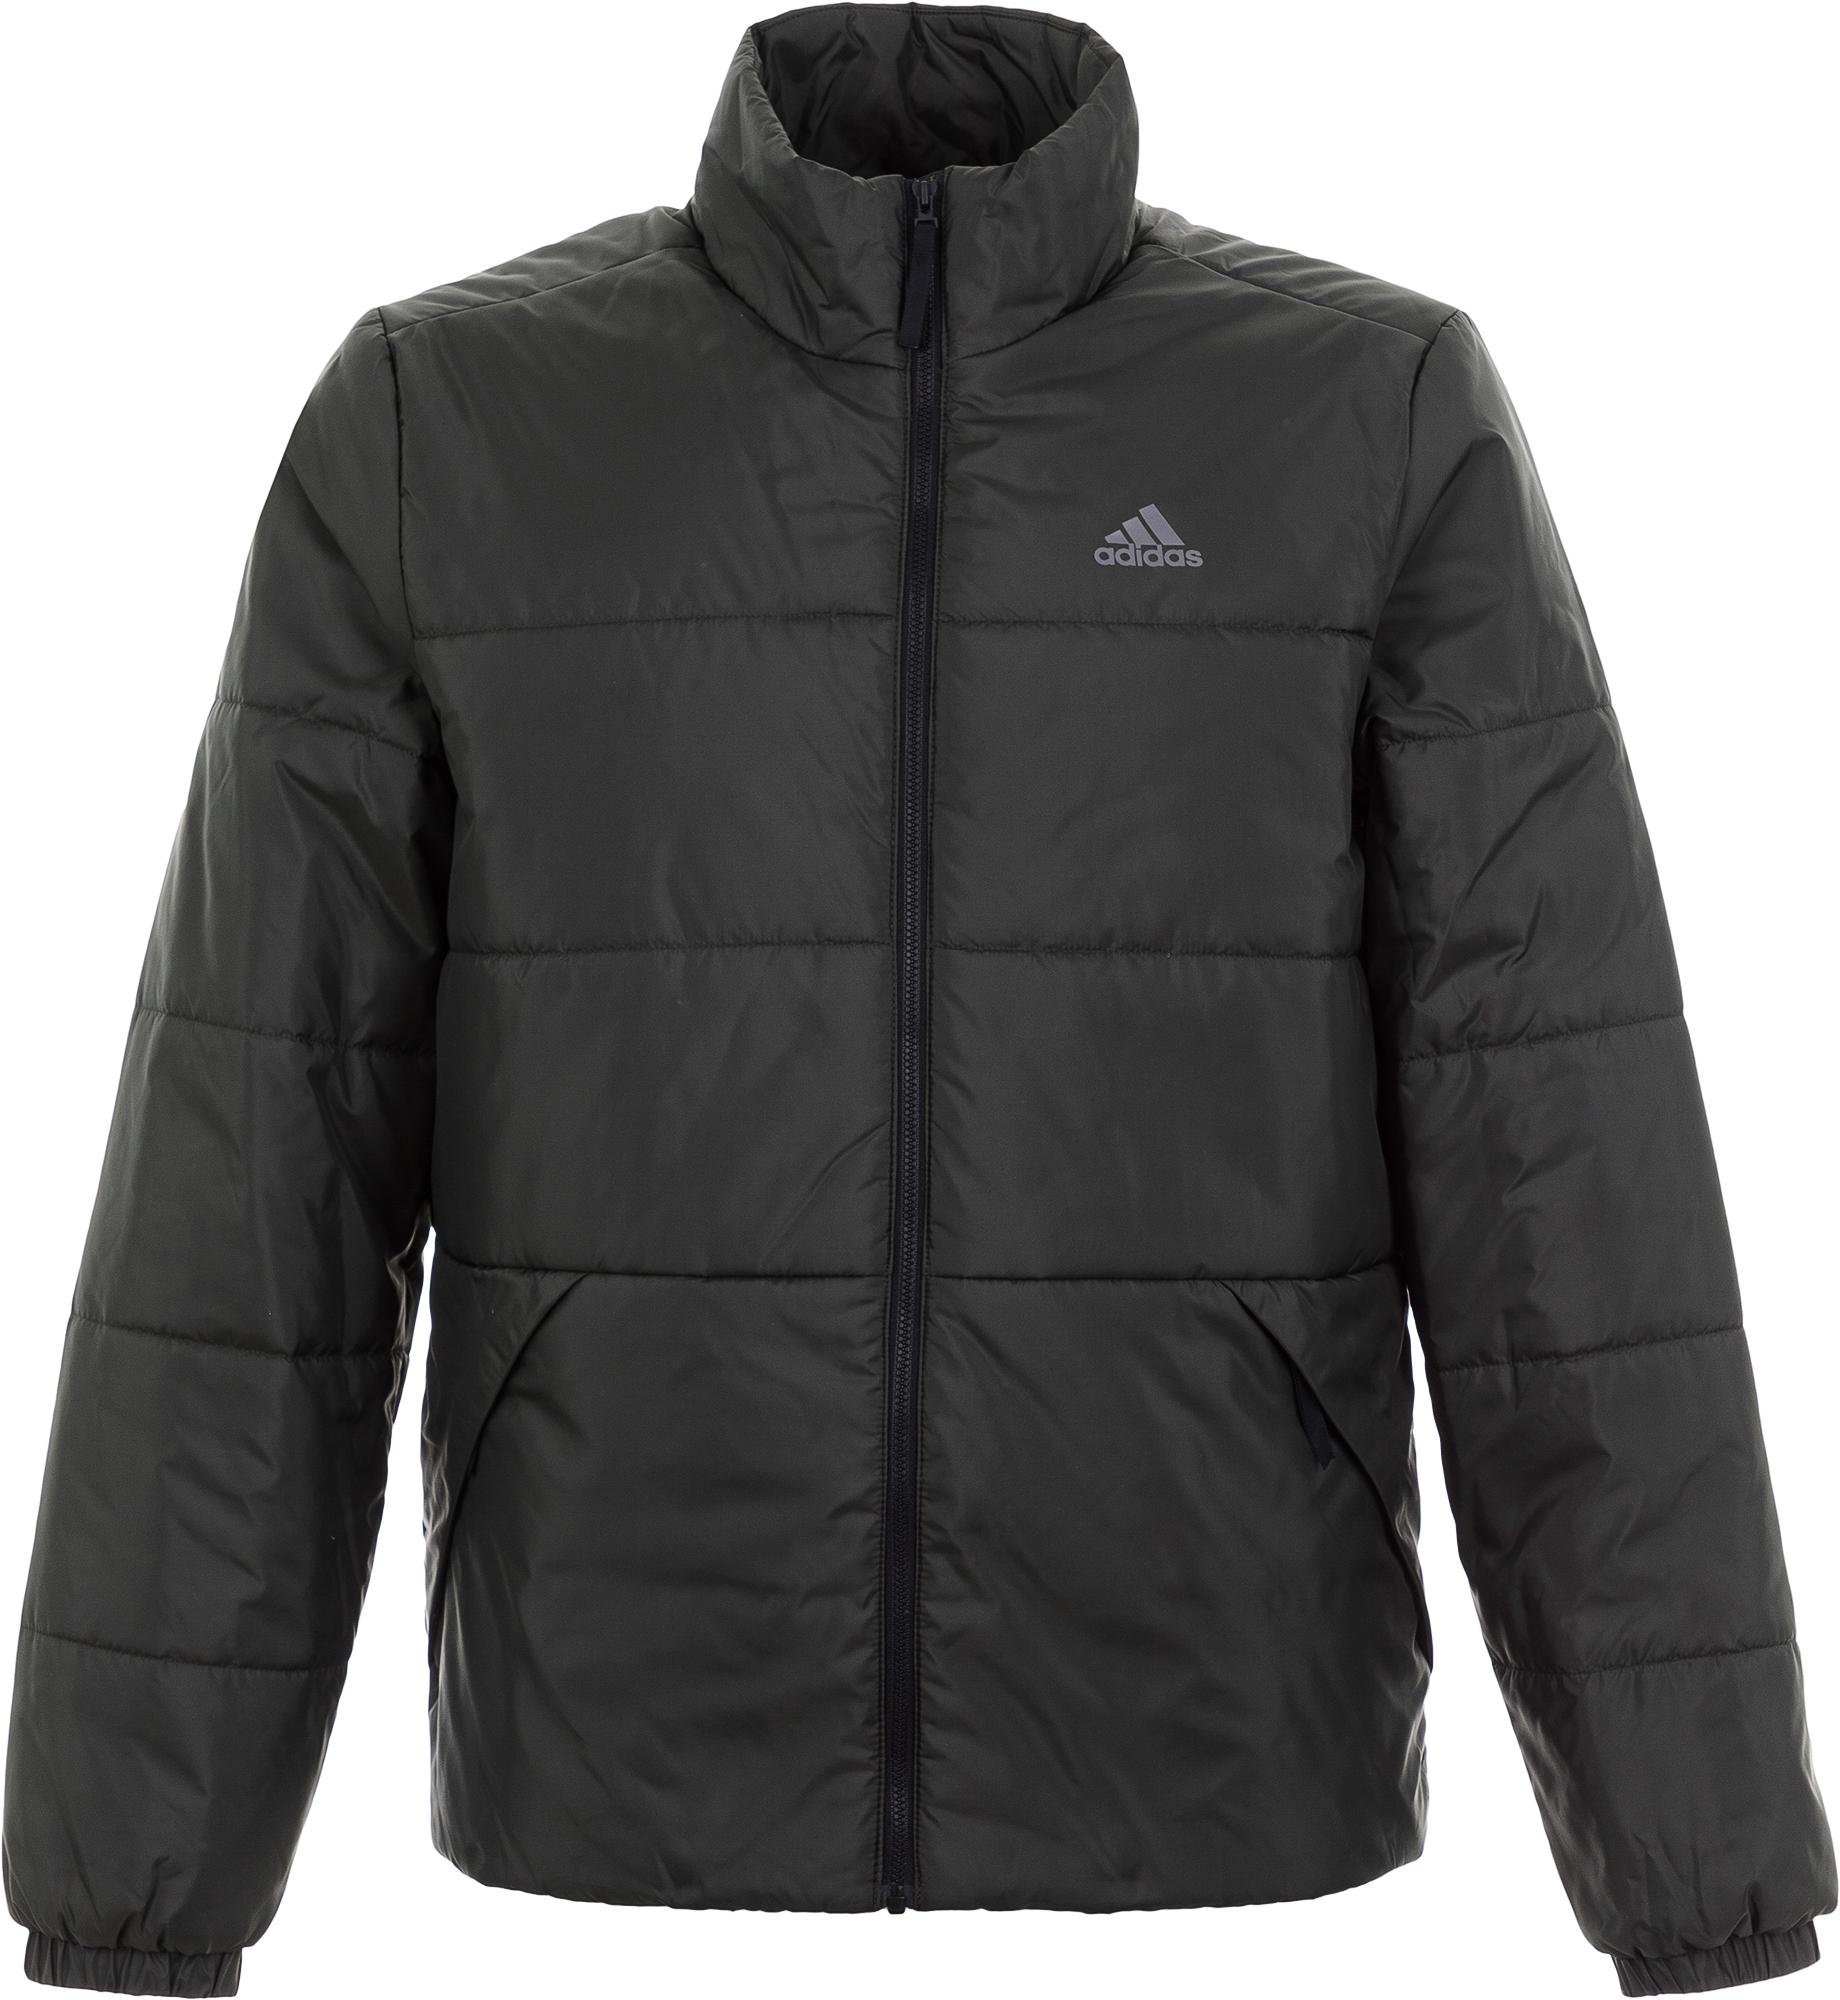 Adidas Куртка утепленная мужская Adidas, размер 54